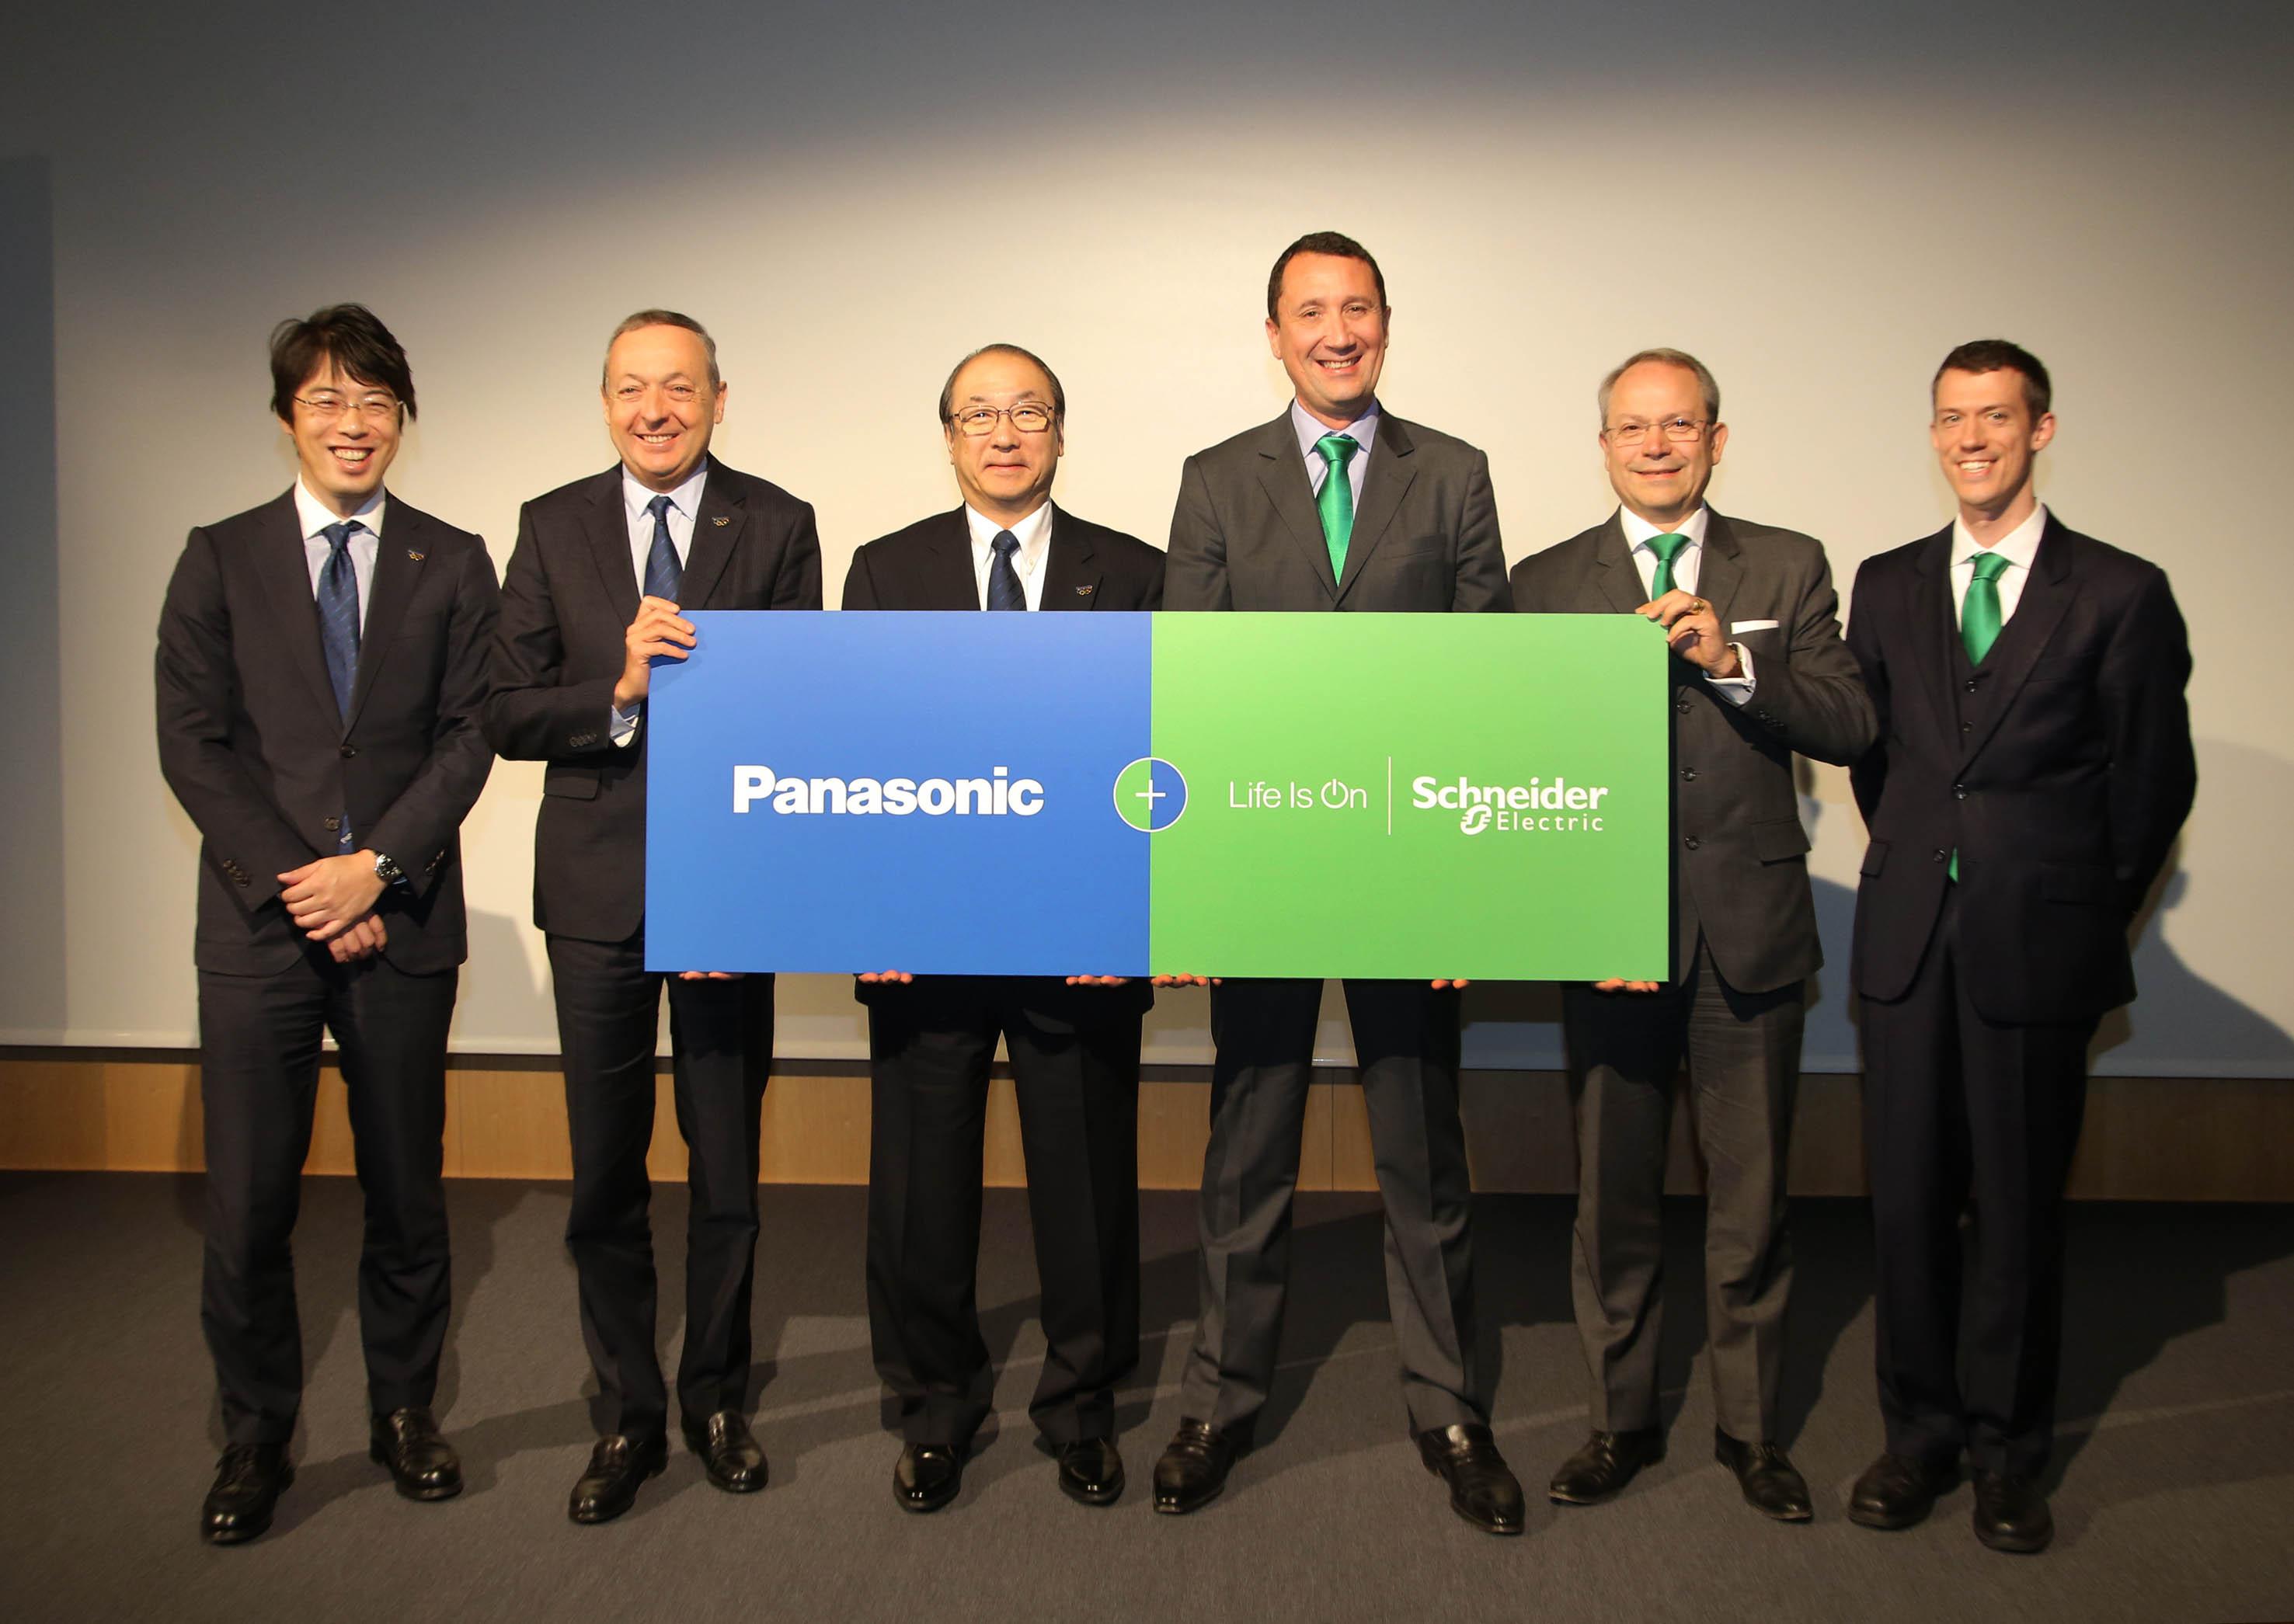 Global Partnership tra Panasonic e Schneider Electric